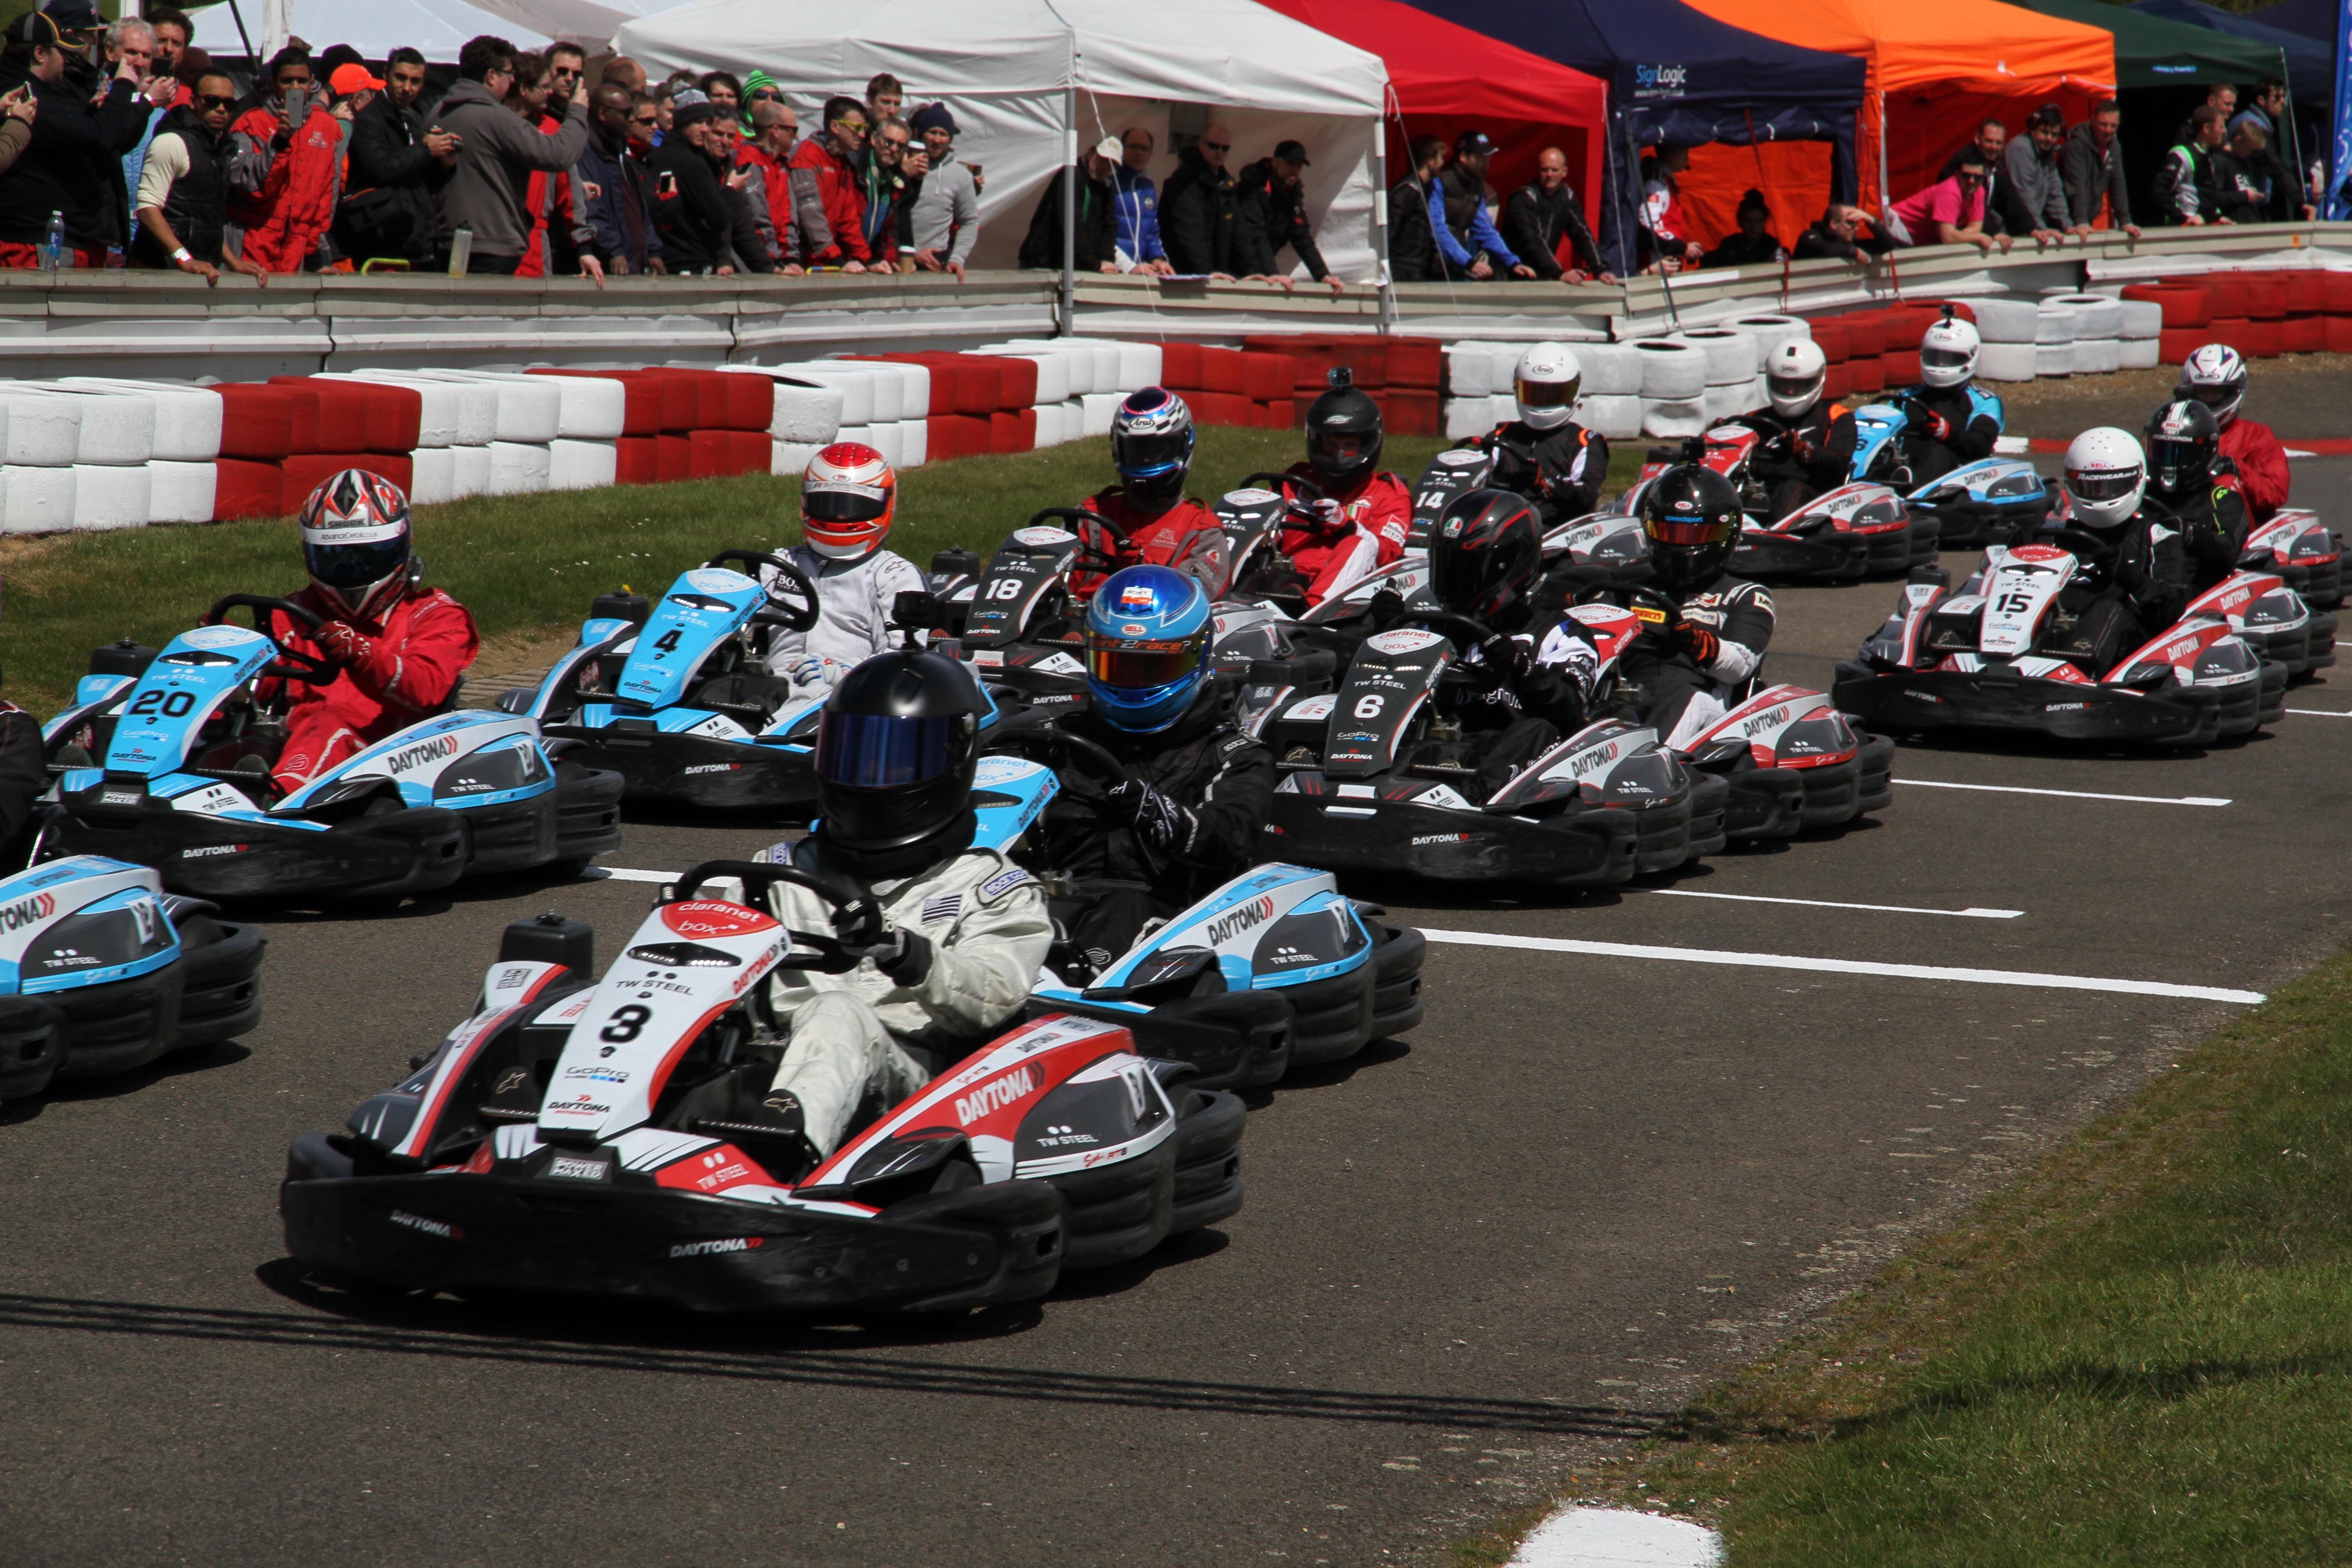 The Daytona Motor Trader Challenge